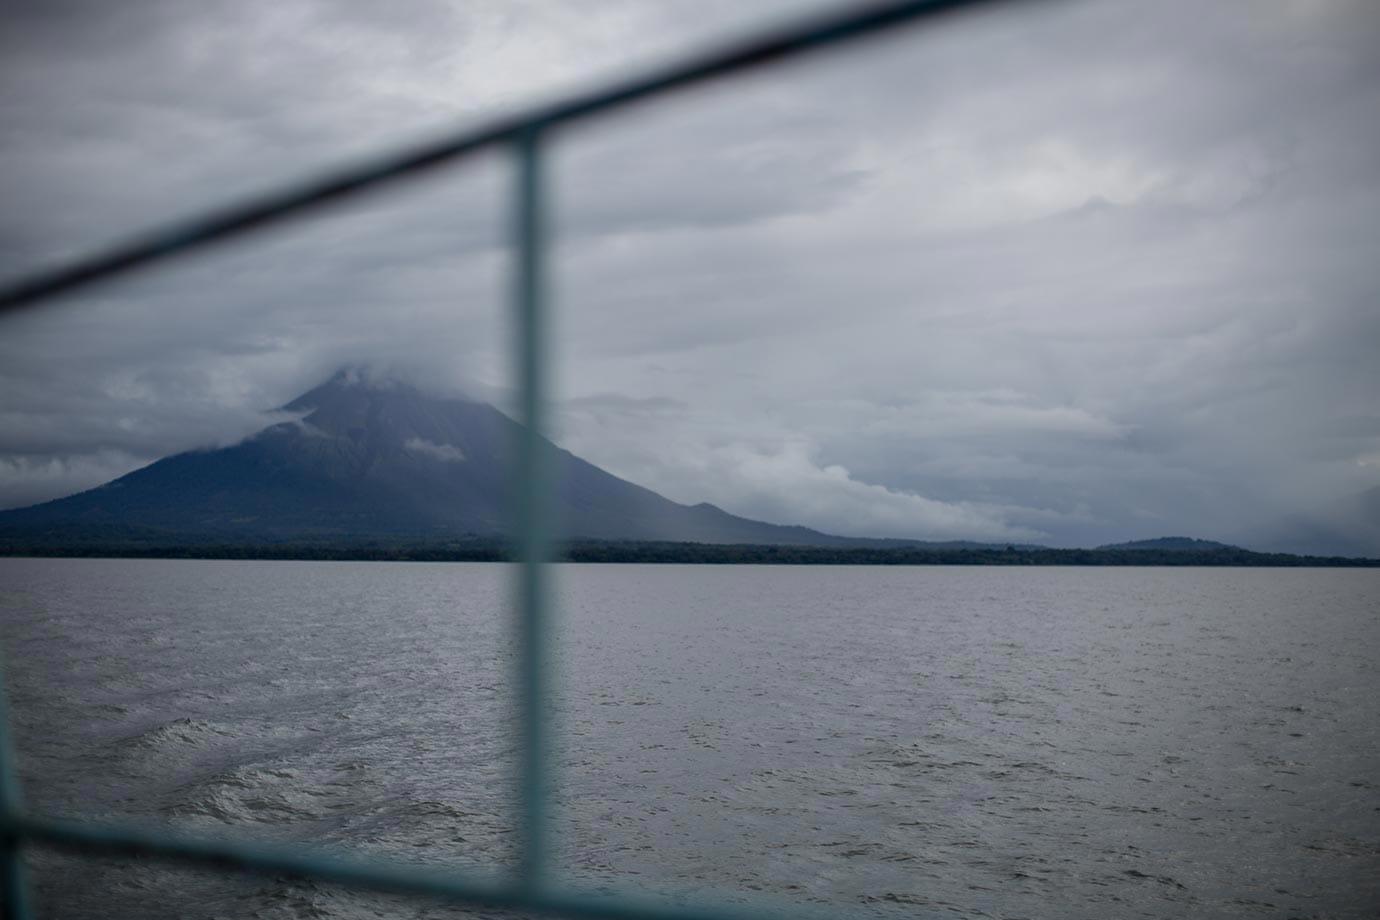 Ferry to Ometepe, Nicaragua